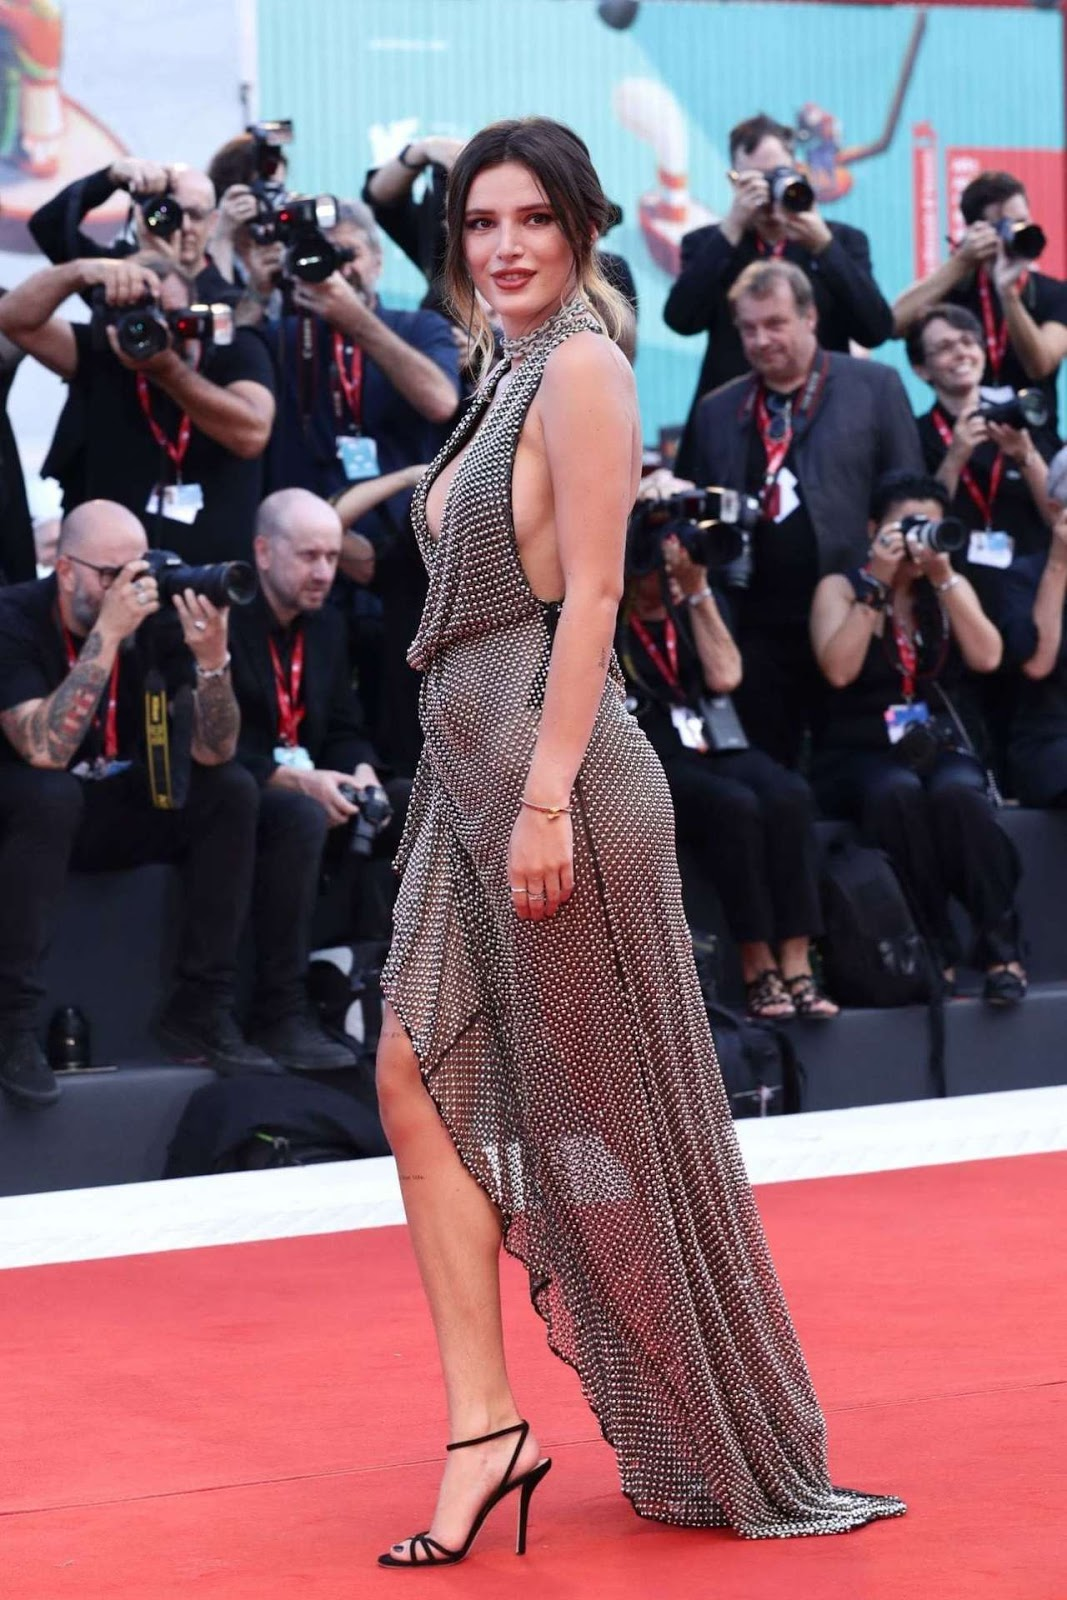 Bella Thorne at the Premiere of 'Joker' at Venice Film Festival 2019